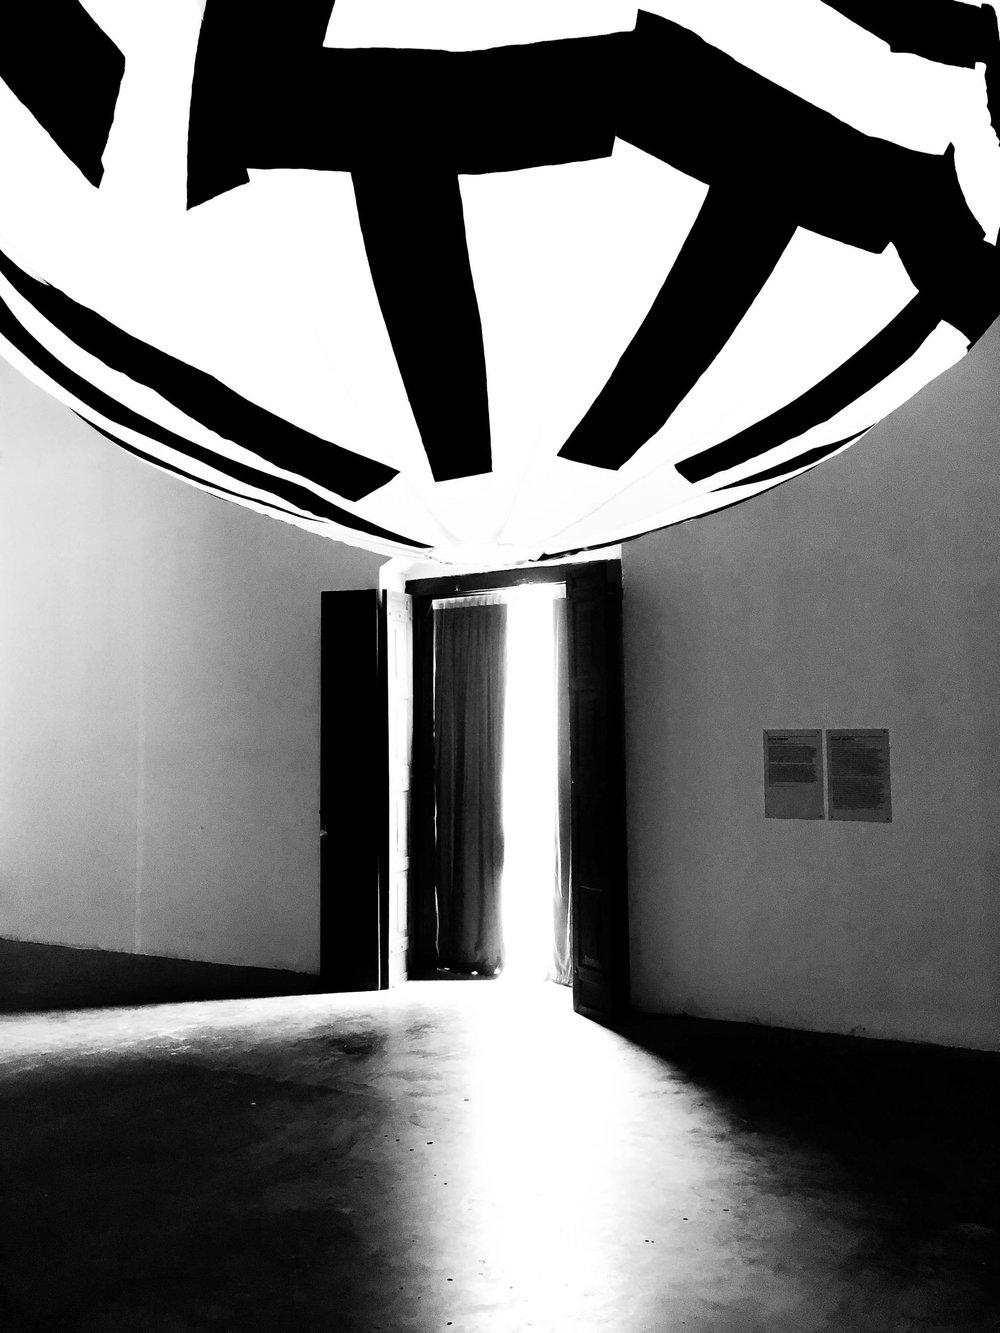 Sindhur_Photography_Kochi Muziris Biennale -2019-30.JPG